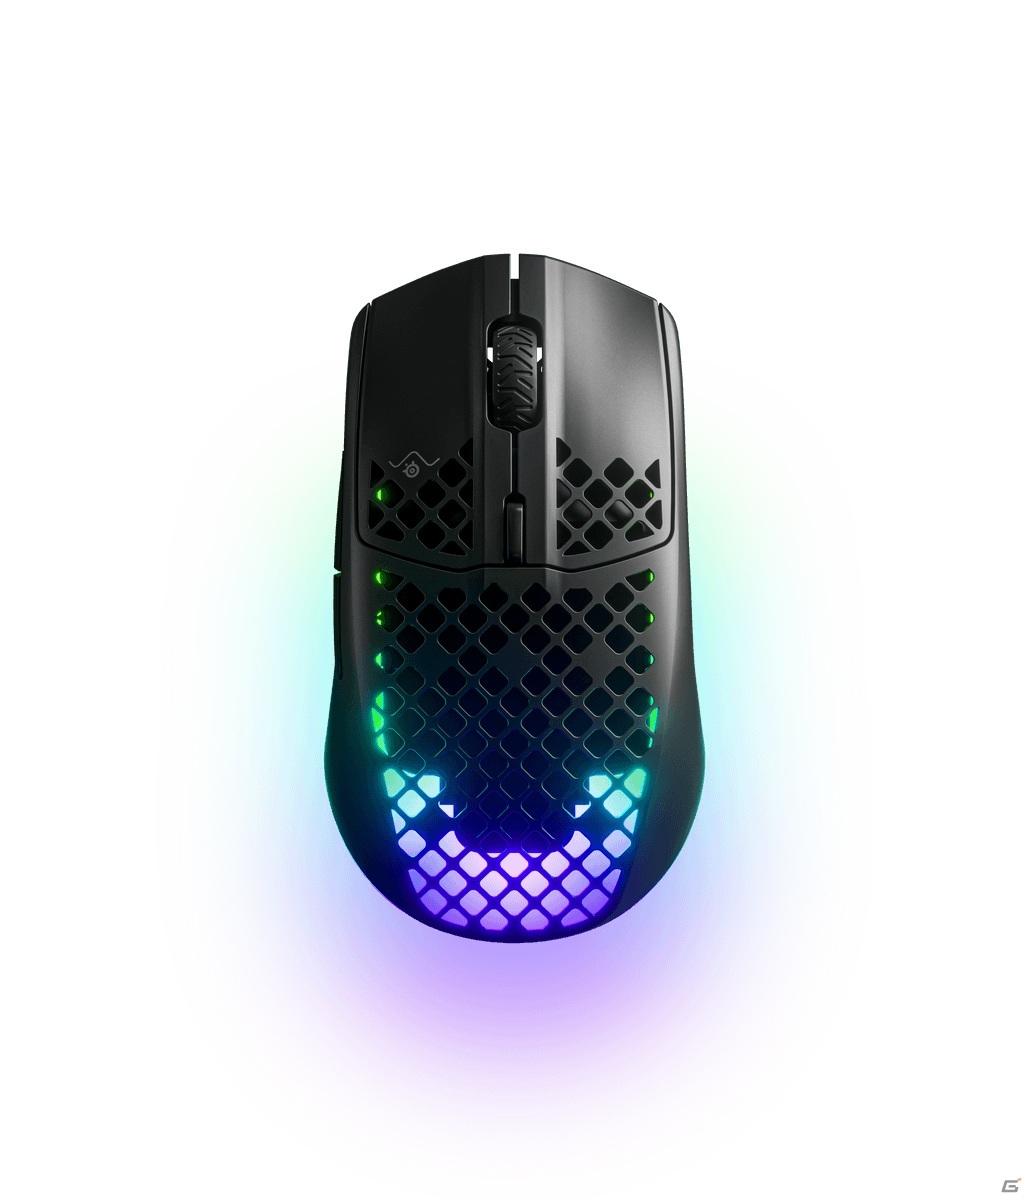 SteelSeries、スピードとパフォーマンスを追求した超軽量ゲーミングマウス「Aerox 3」「Aerox 3 Wireless」を発表